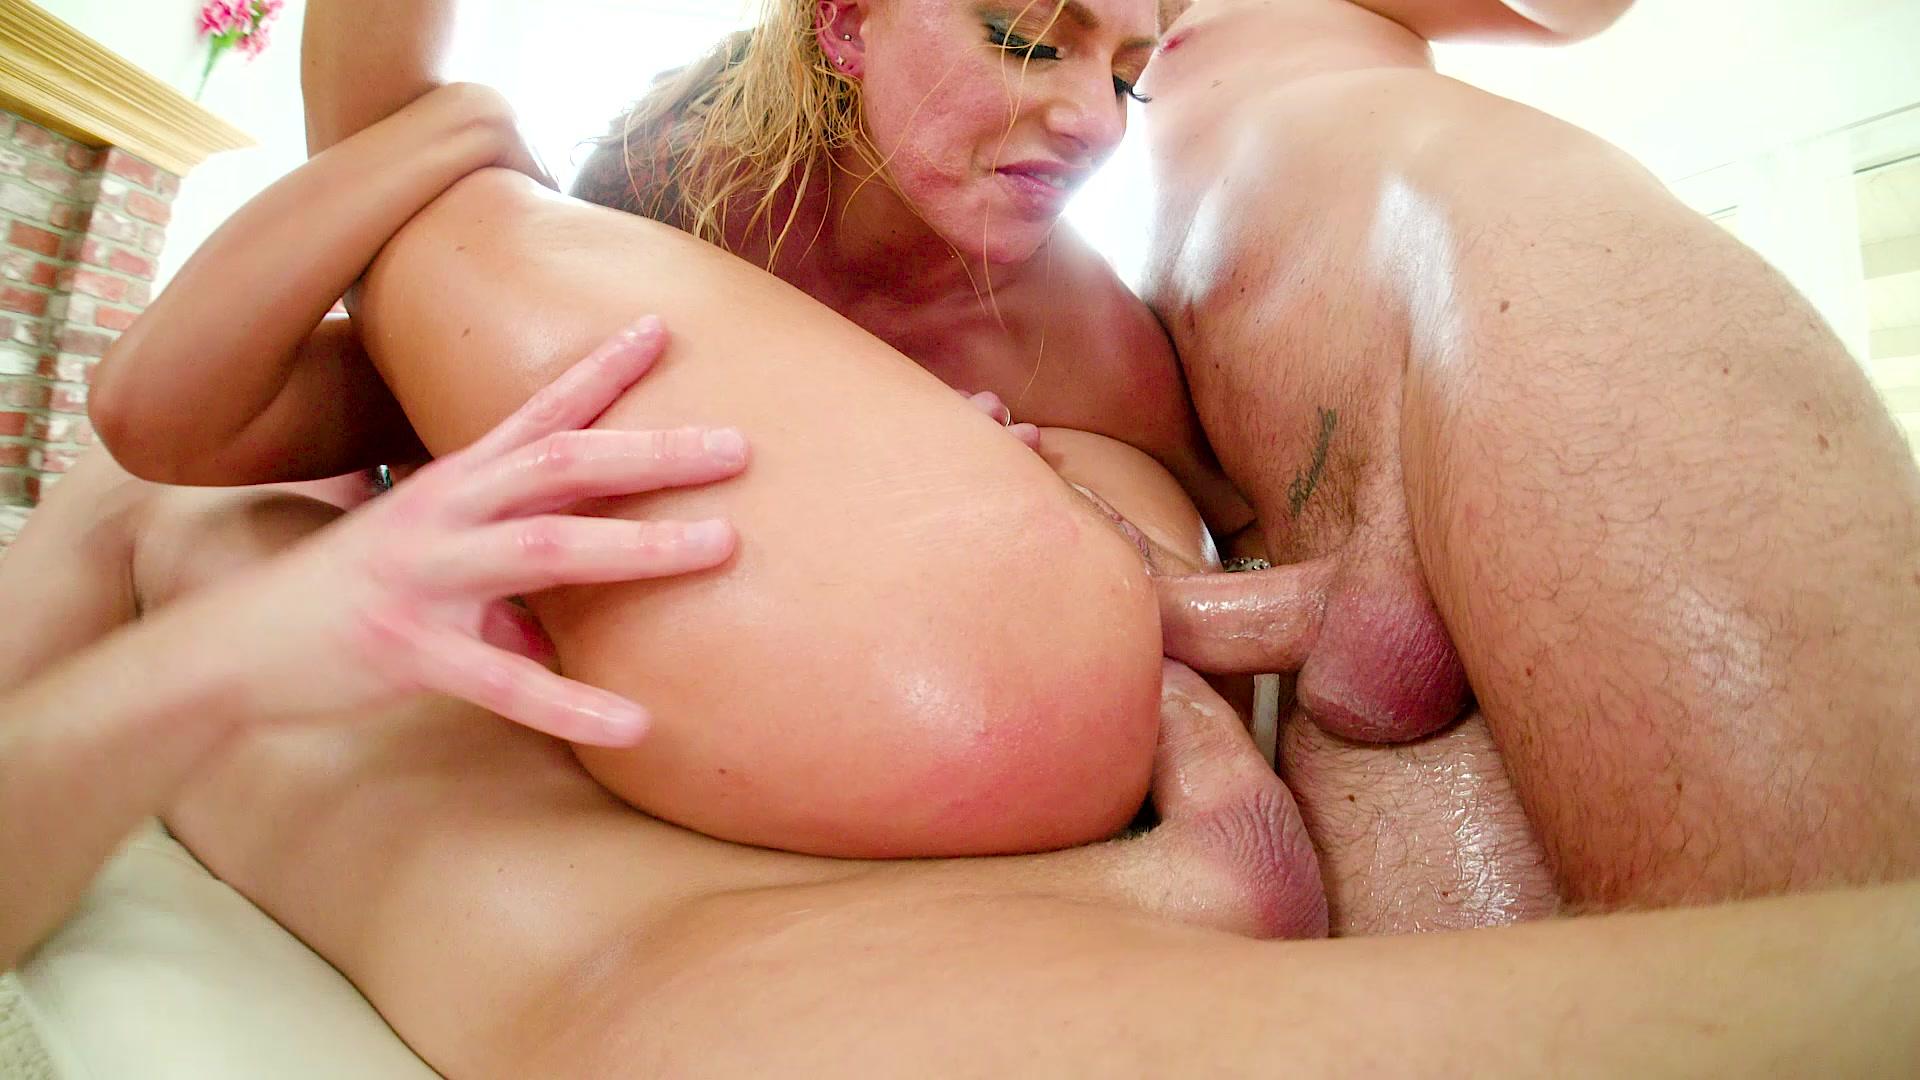 Big saggy tits divine breasts janet